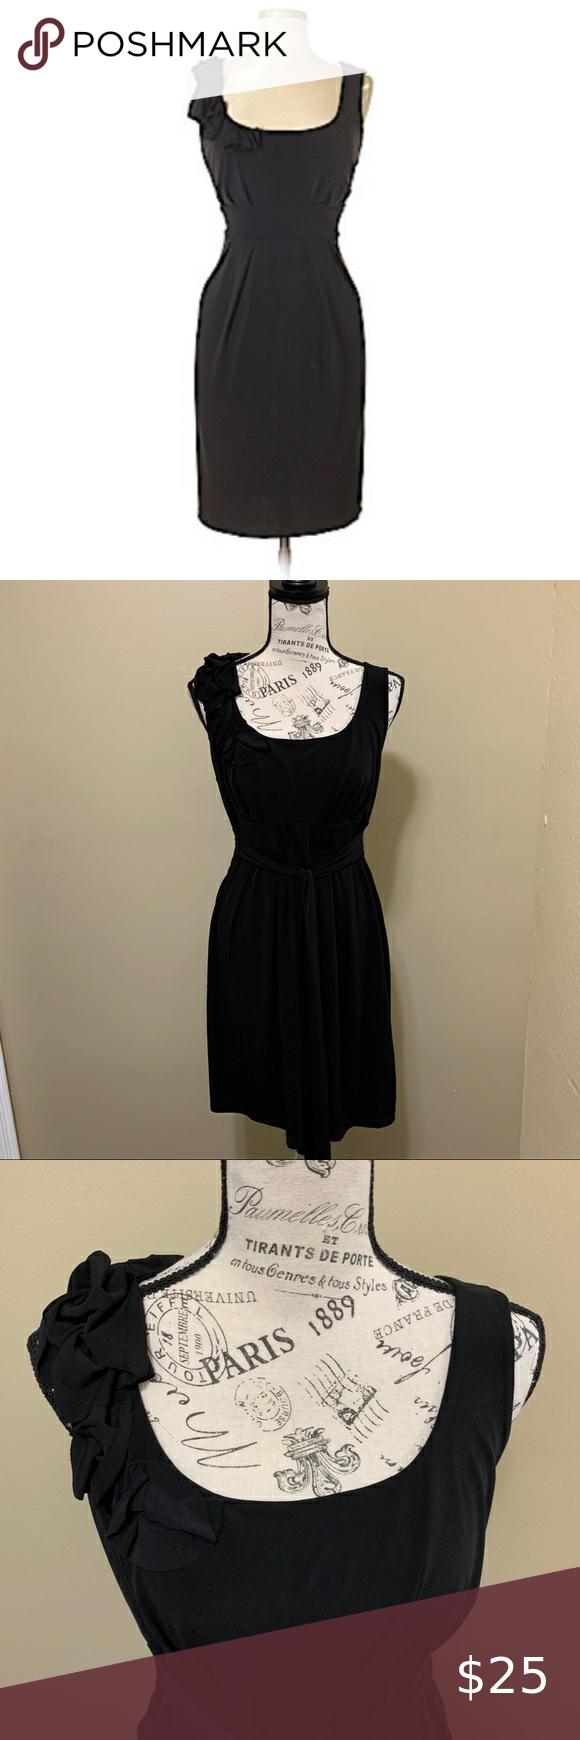 Iz Byer Black Sleeveless Dress Xl Black Sleeveless Dress Dresses Scoop Neck Dress [ 1740 x 580 Pixel ]